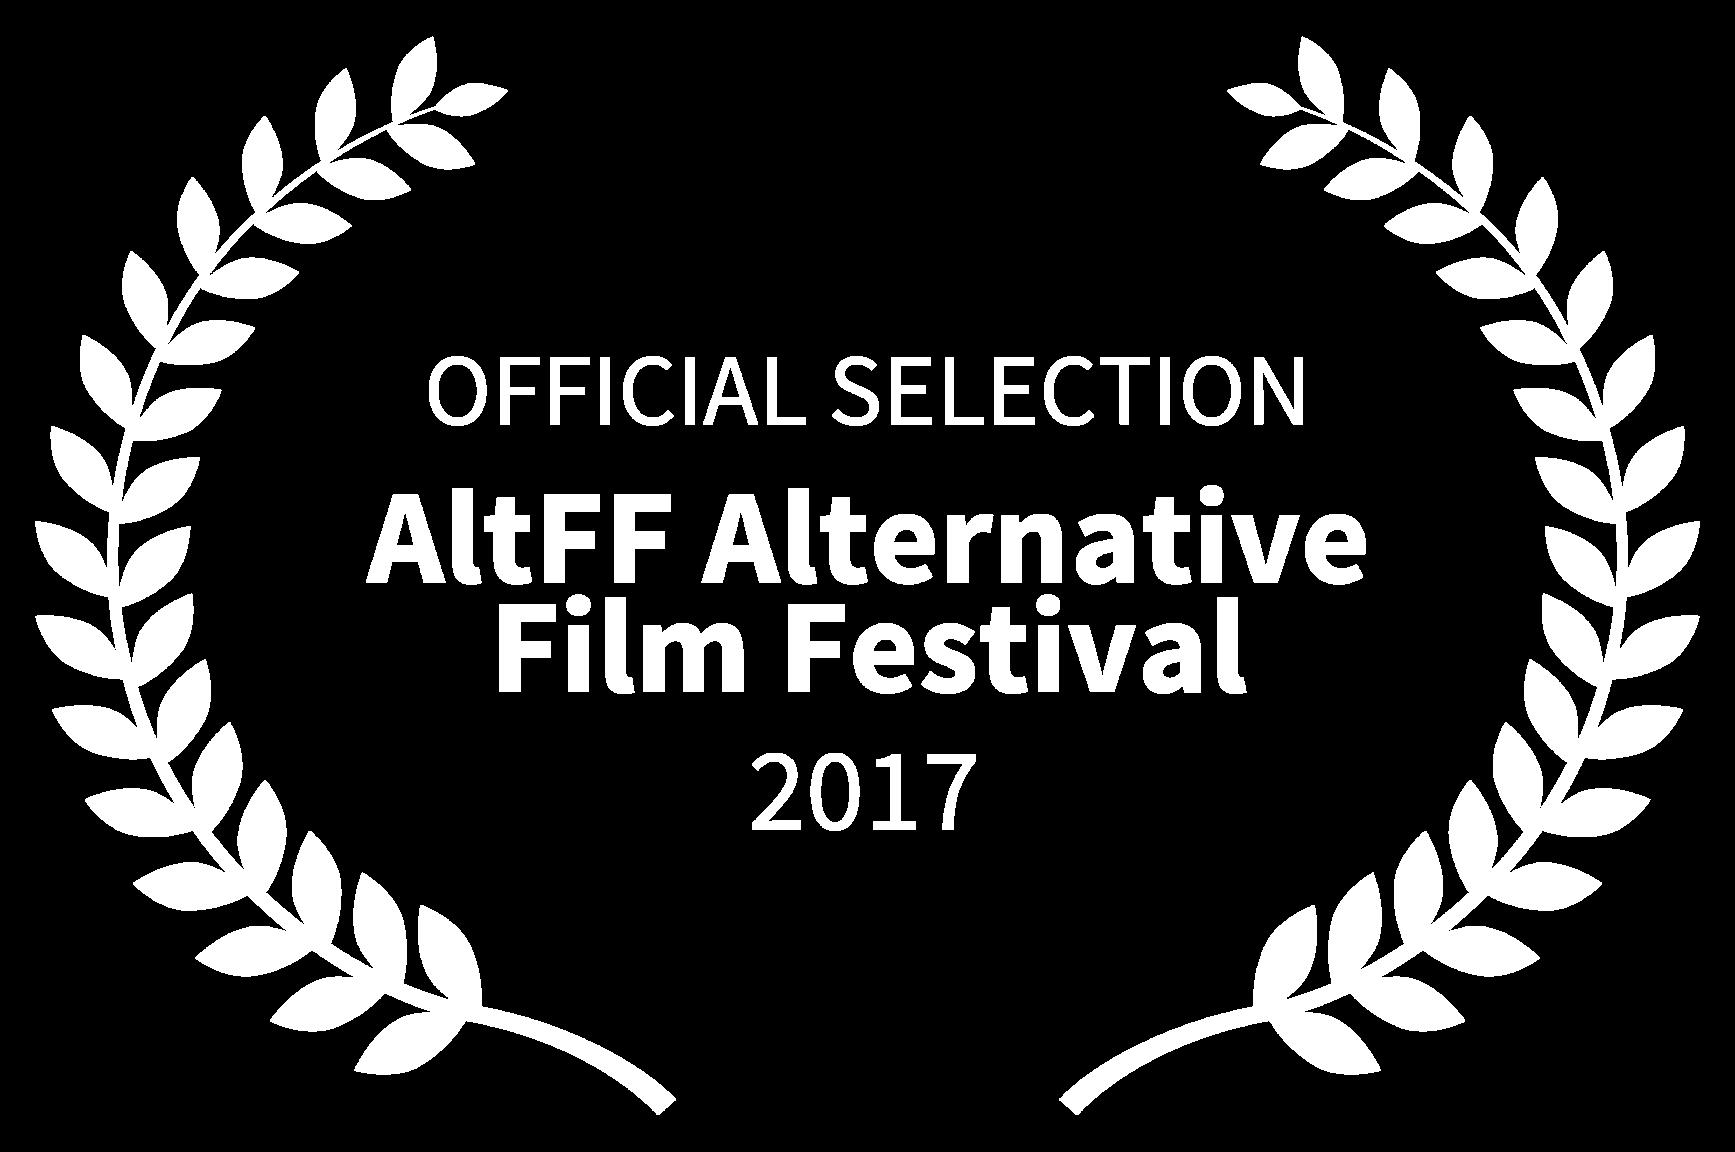 OFFICIAL SELECTION - AltFF Alternative Film Festival - 2017.png